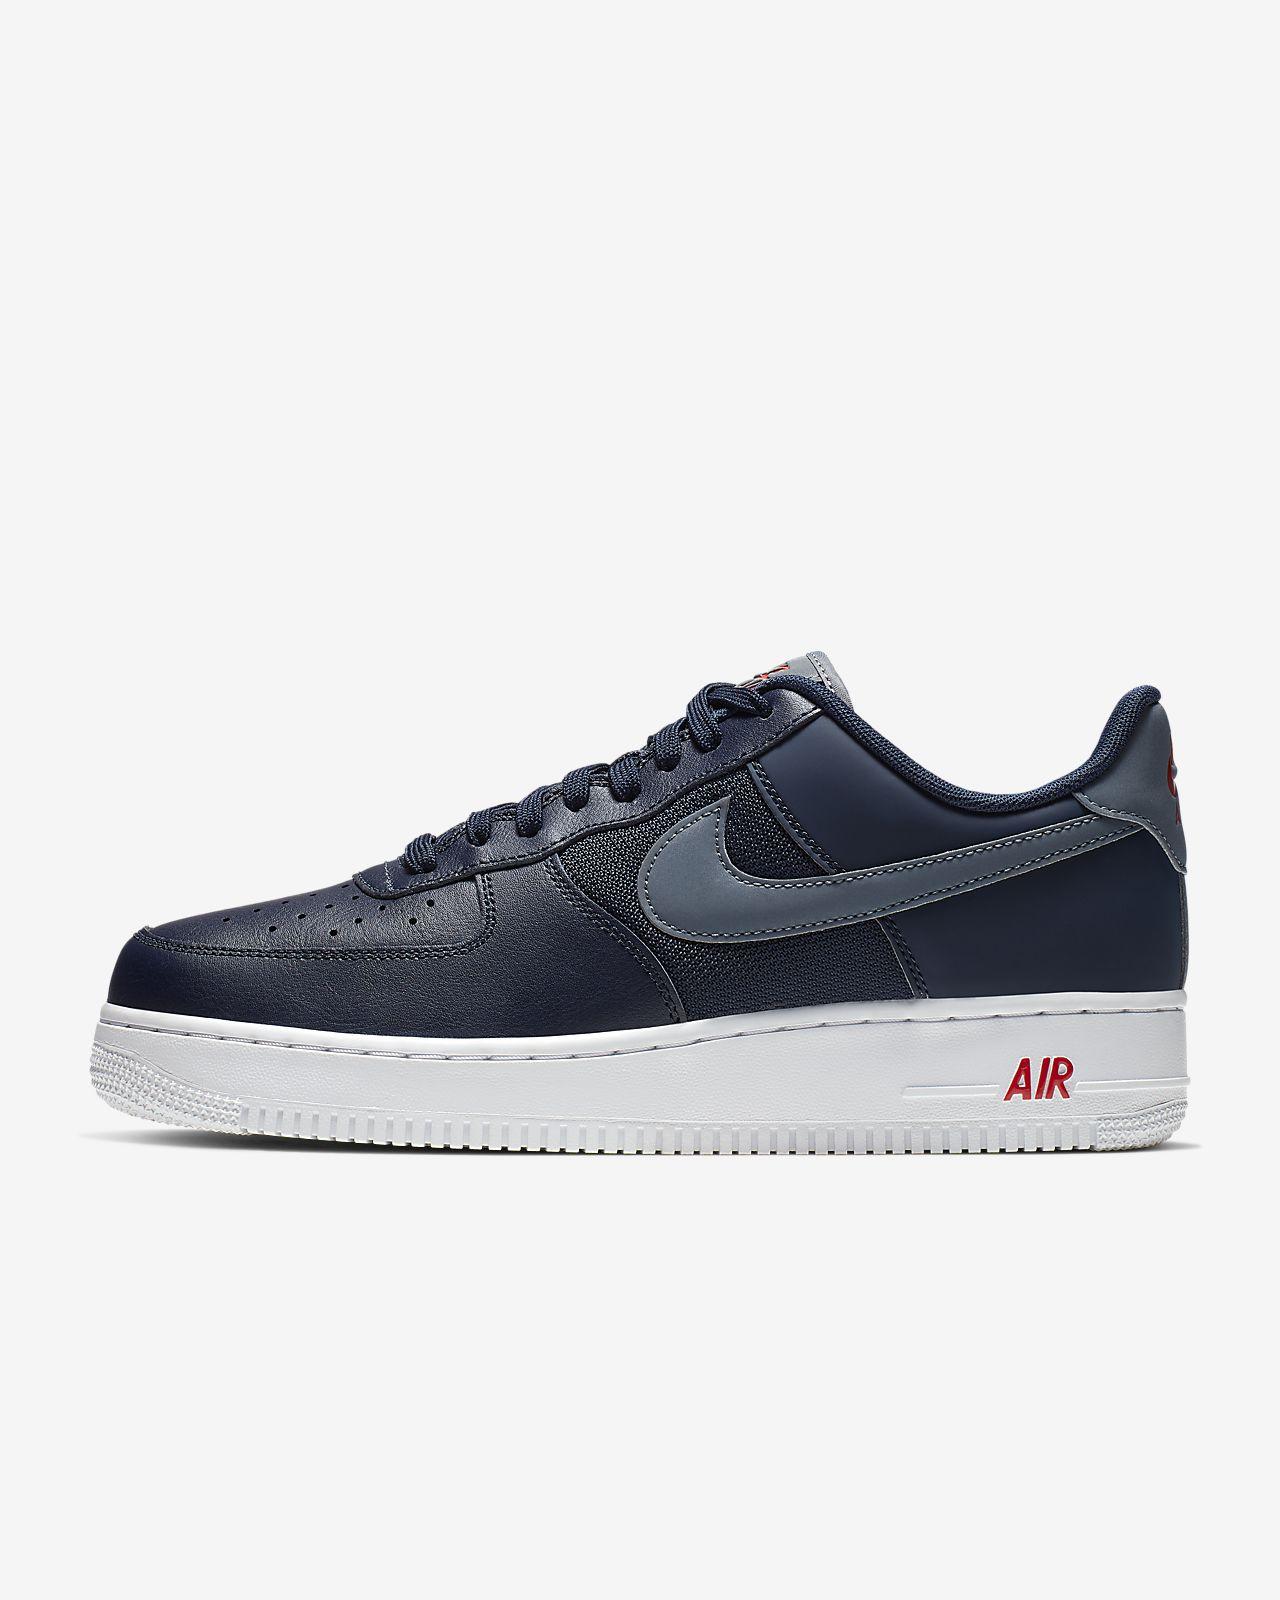 factory authentic 9890f 40fe8 ... Nike Air Force 1  07 LV8 Men s Shoe